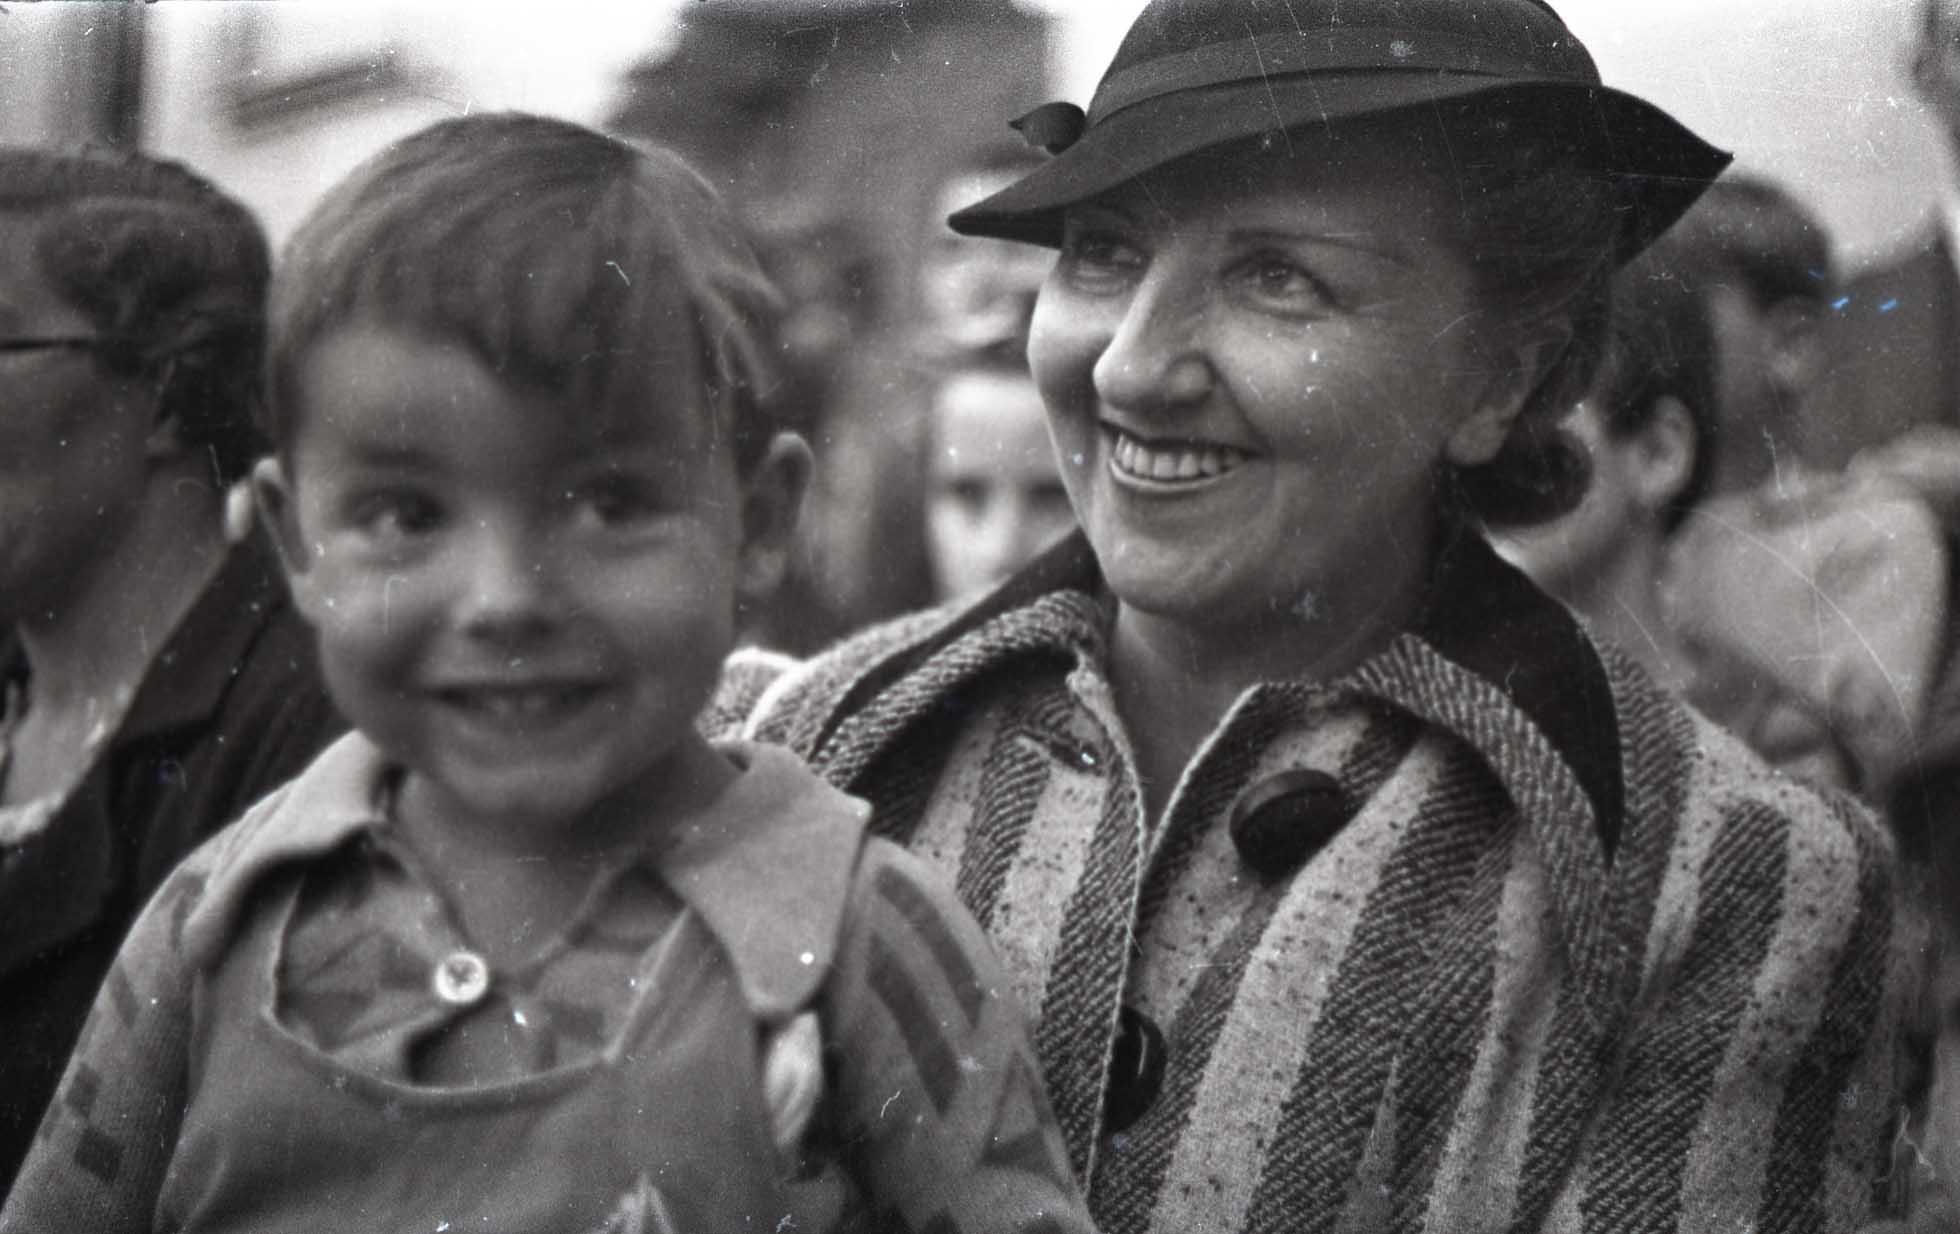 "Dolores Rivas Cherif, esposa de Manuel Azaña, con el niño ""Chencho"" Sans Yañez. Colonia Sueca de Teiá. Barcelona, 1938. Walter Reuter. ©Fondo Guillermo Fernández Zúñiga."